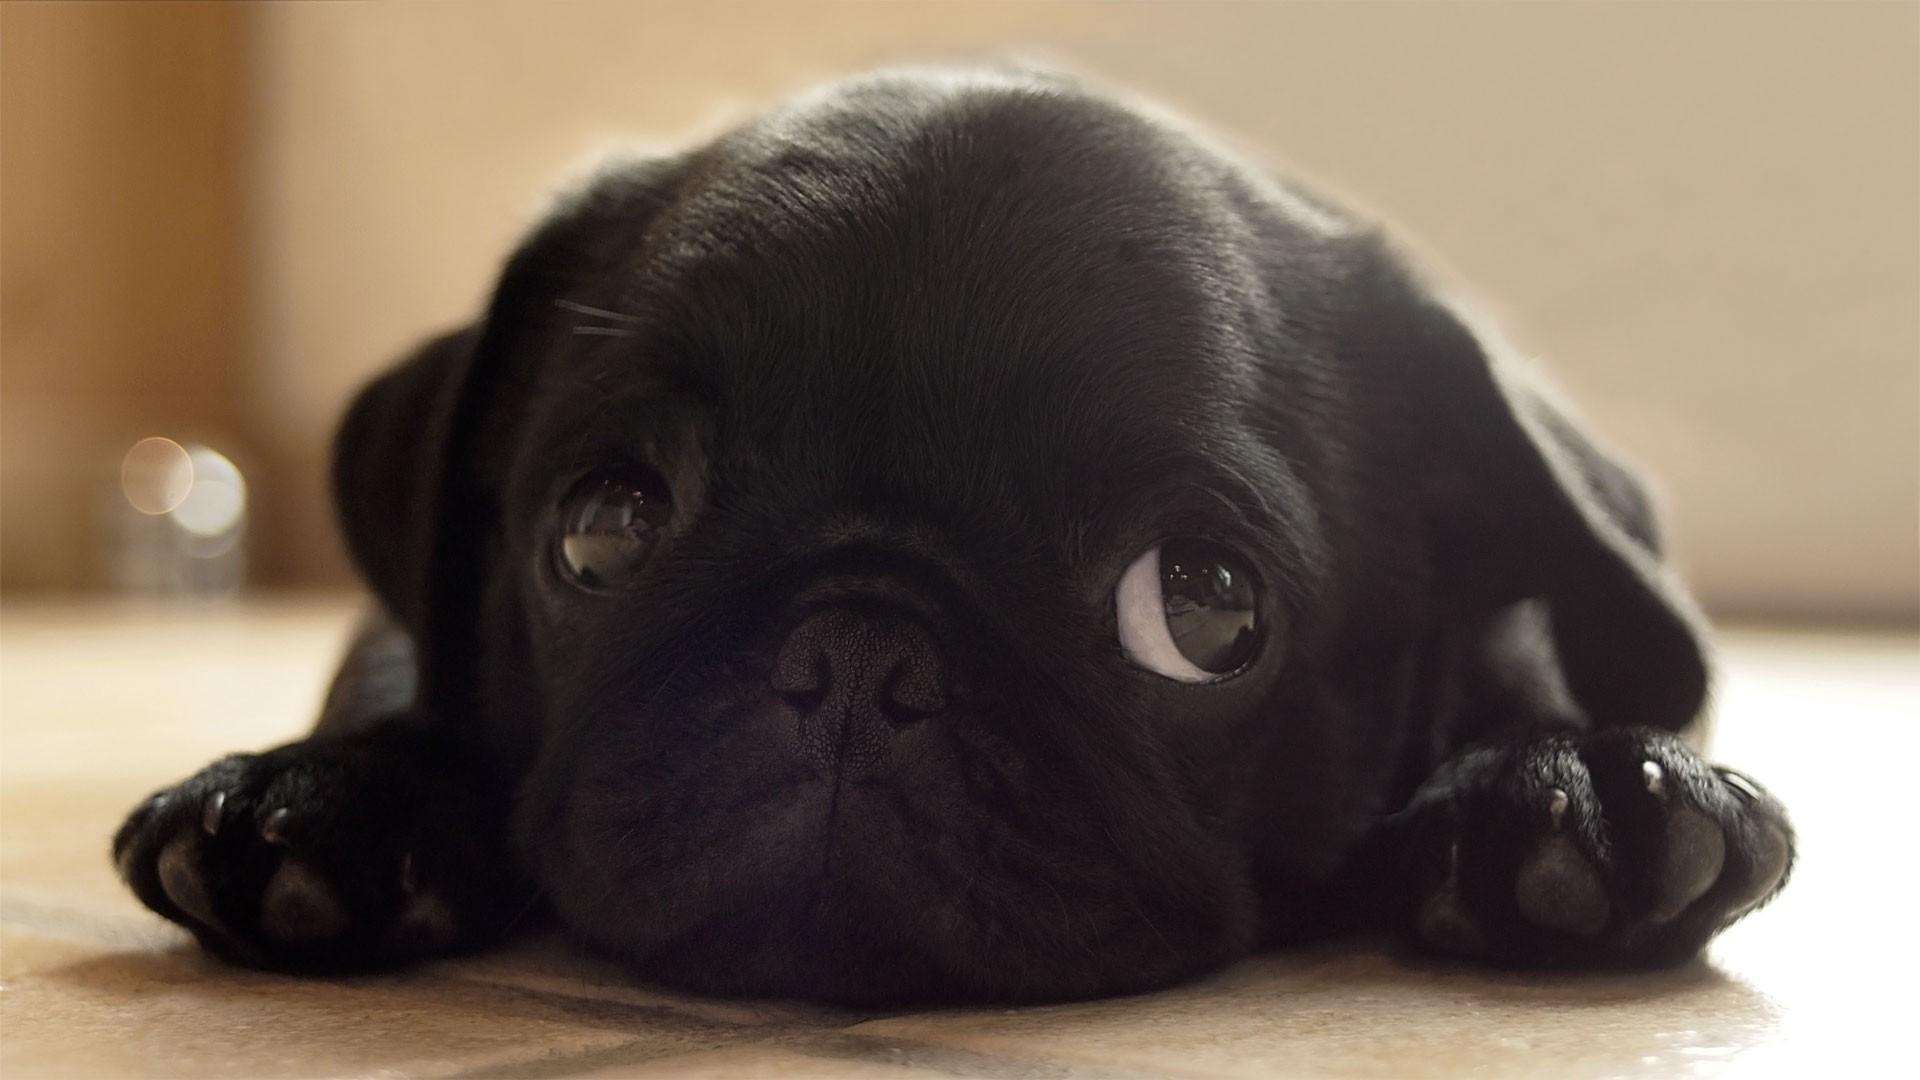 Free download Black animals dogs pugs puppies pug wallpaper